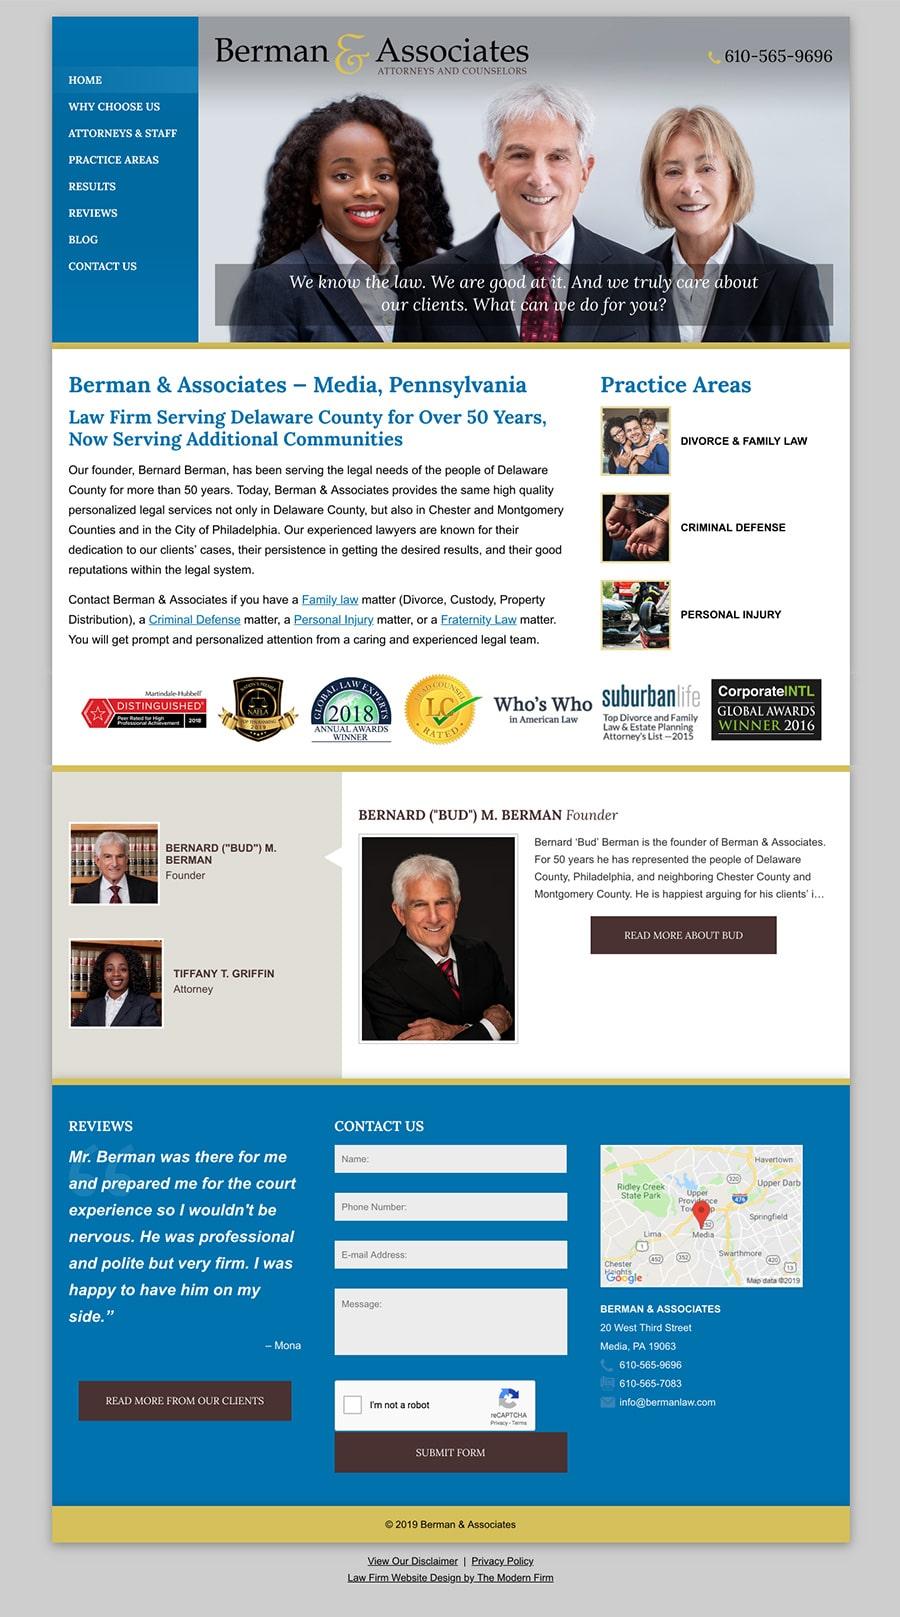 Law Firm Website Design for Berman & Associates